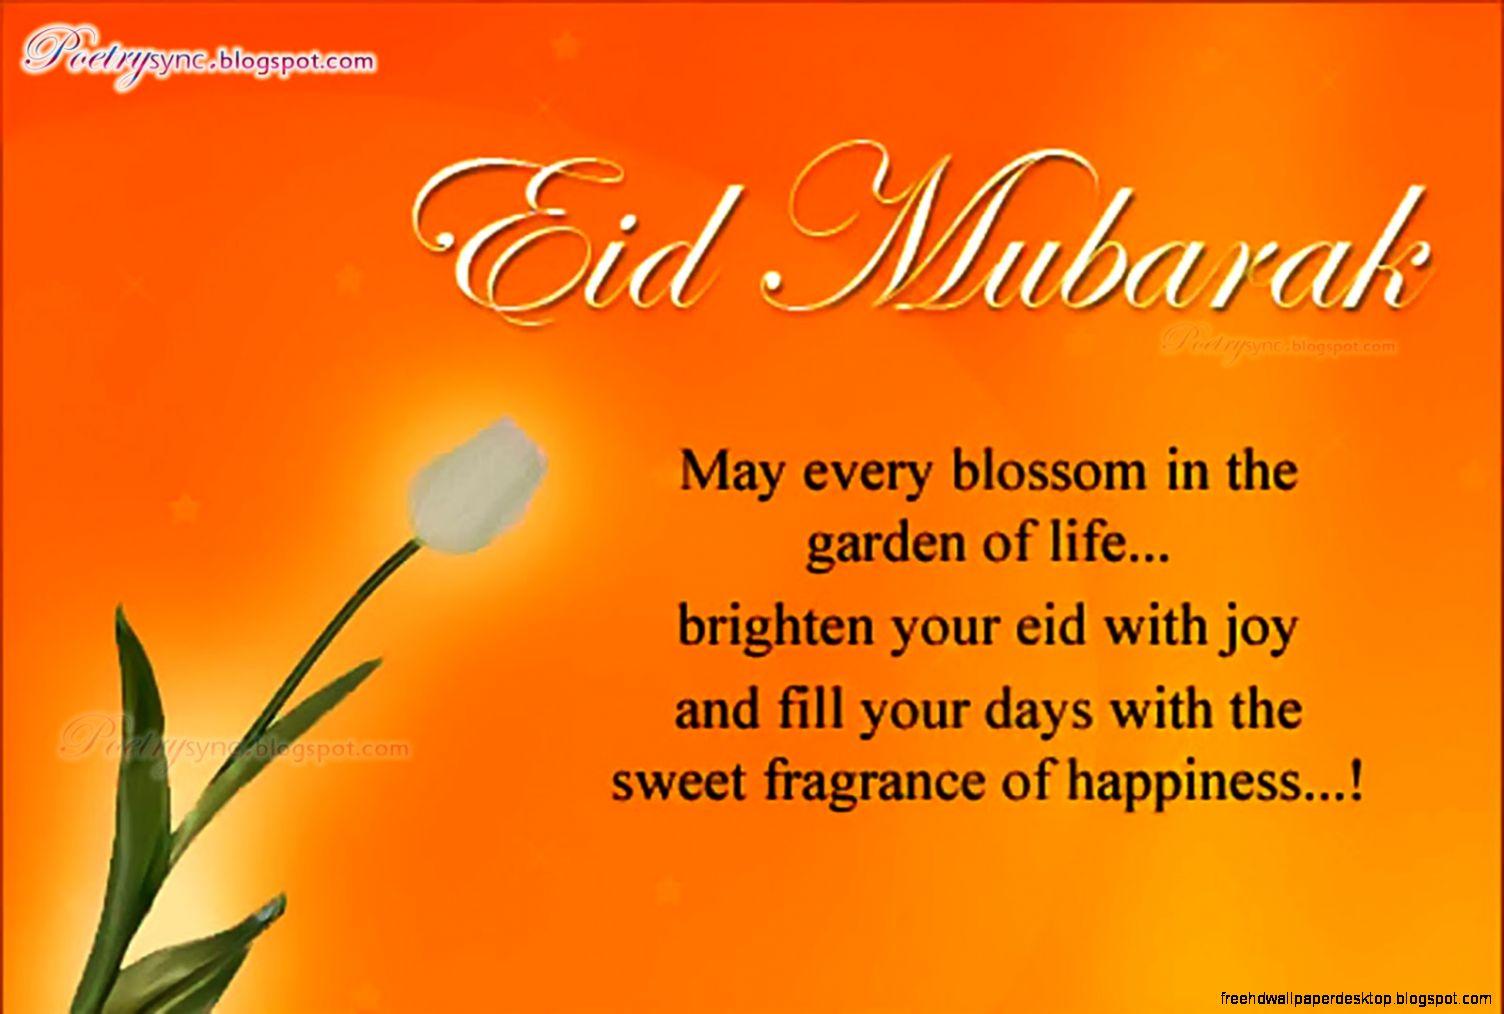 Joyful Eid Mubarak Quote Free High Definition Wallpapers